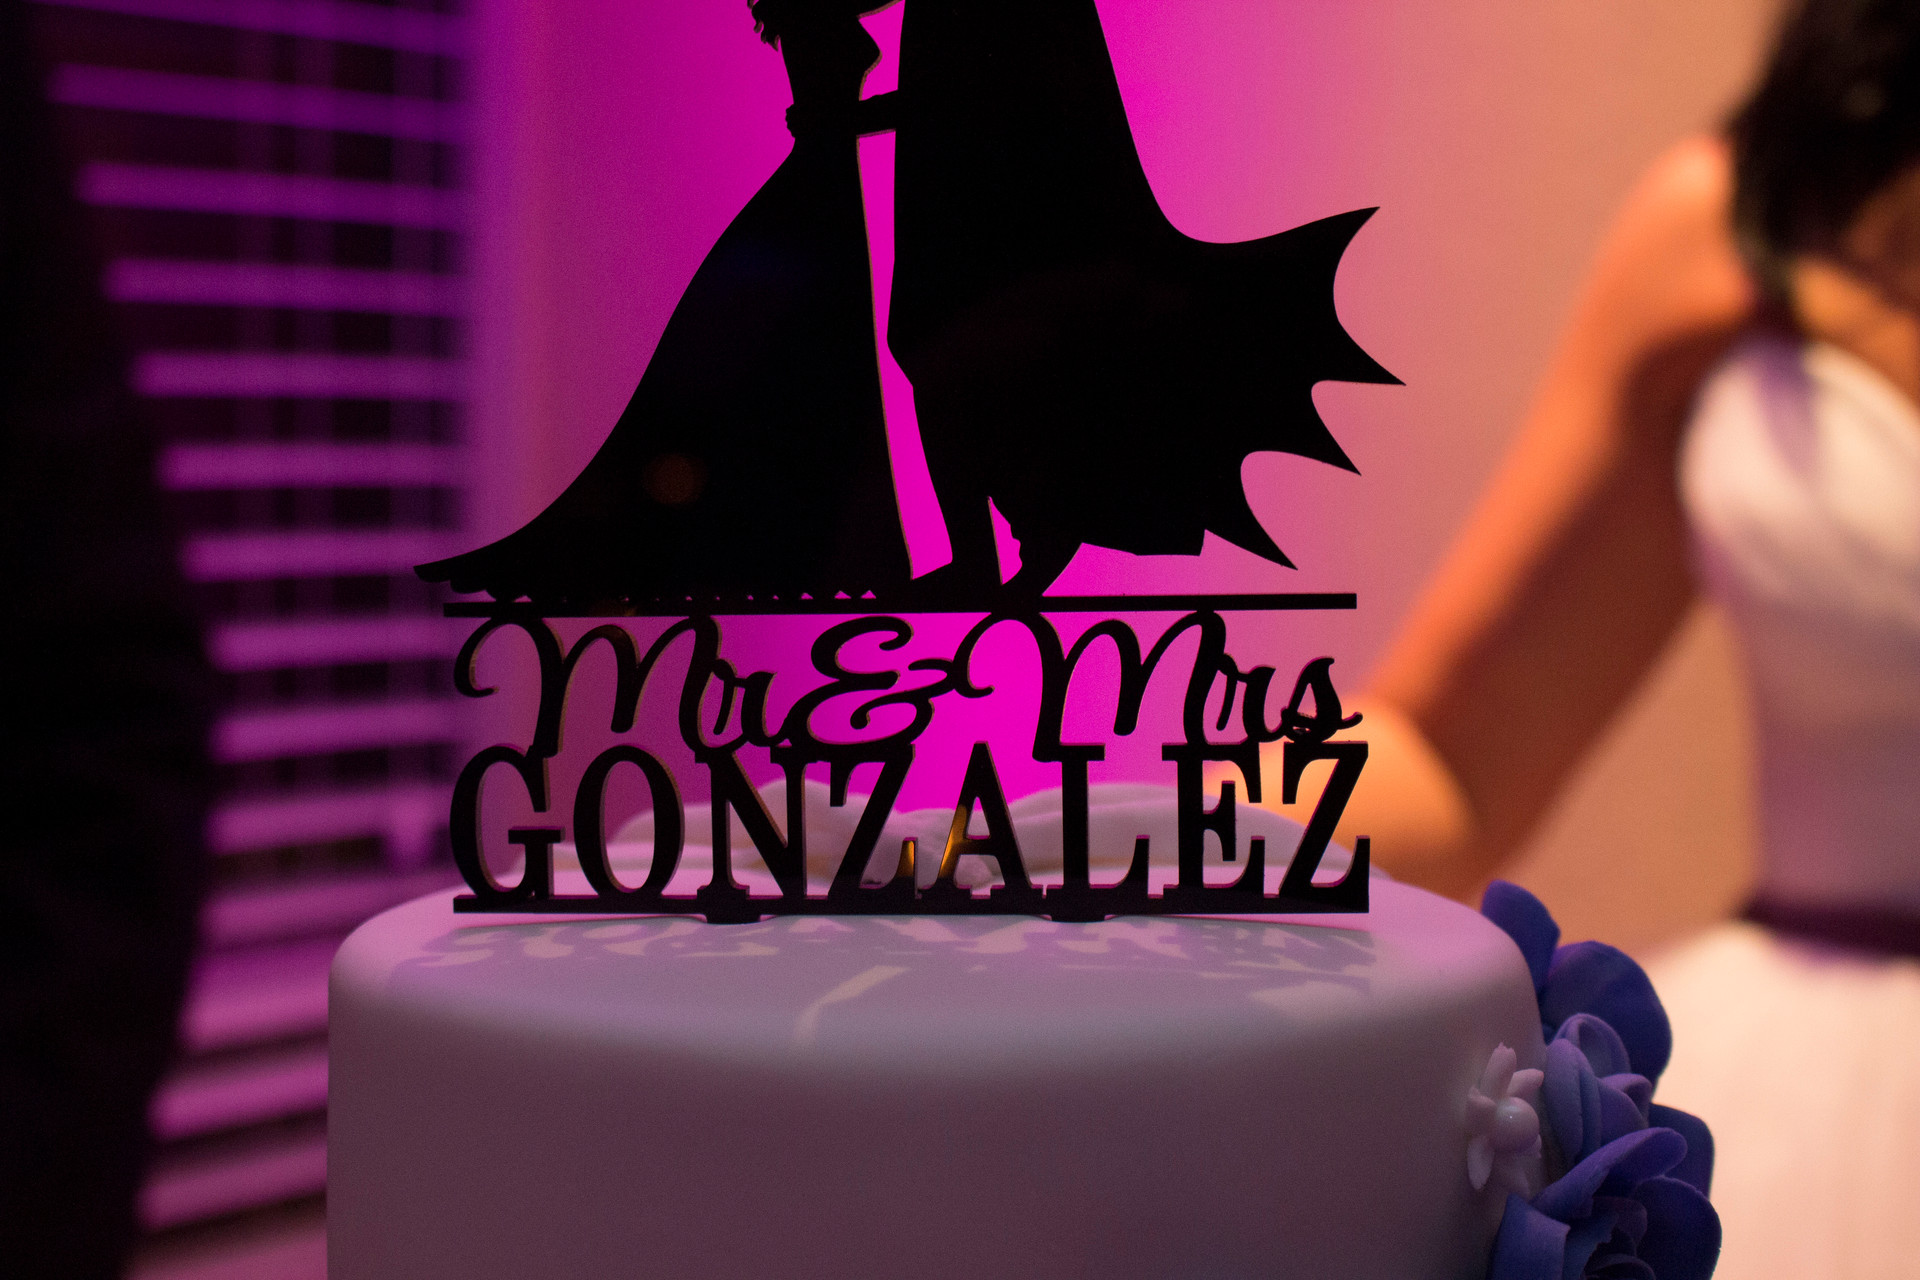 wedding cake photo ideas